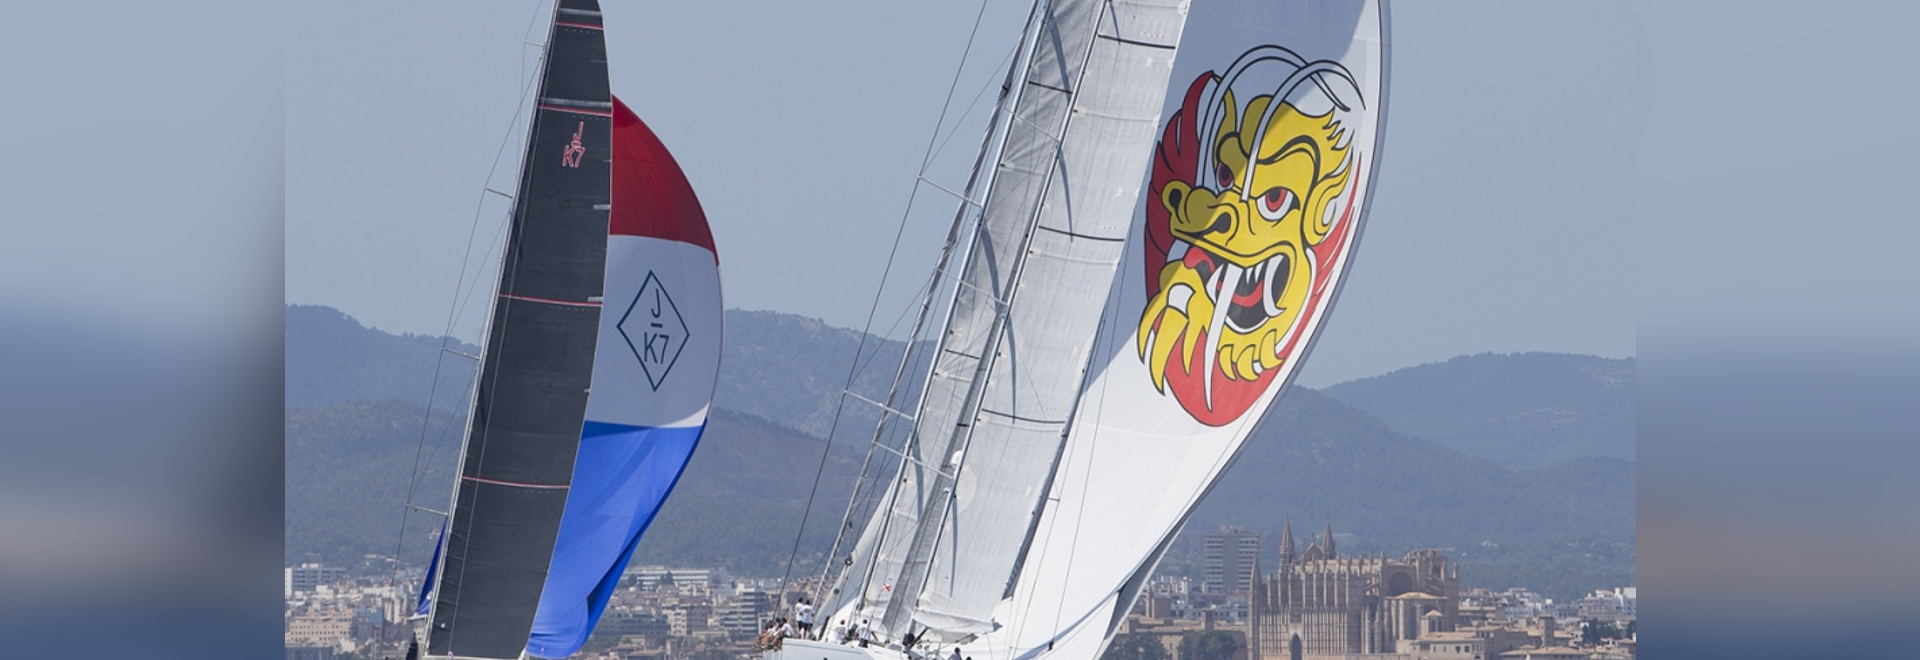 Superyacht-Cup Palma abgesagt